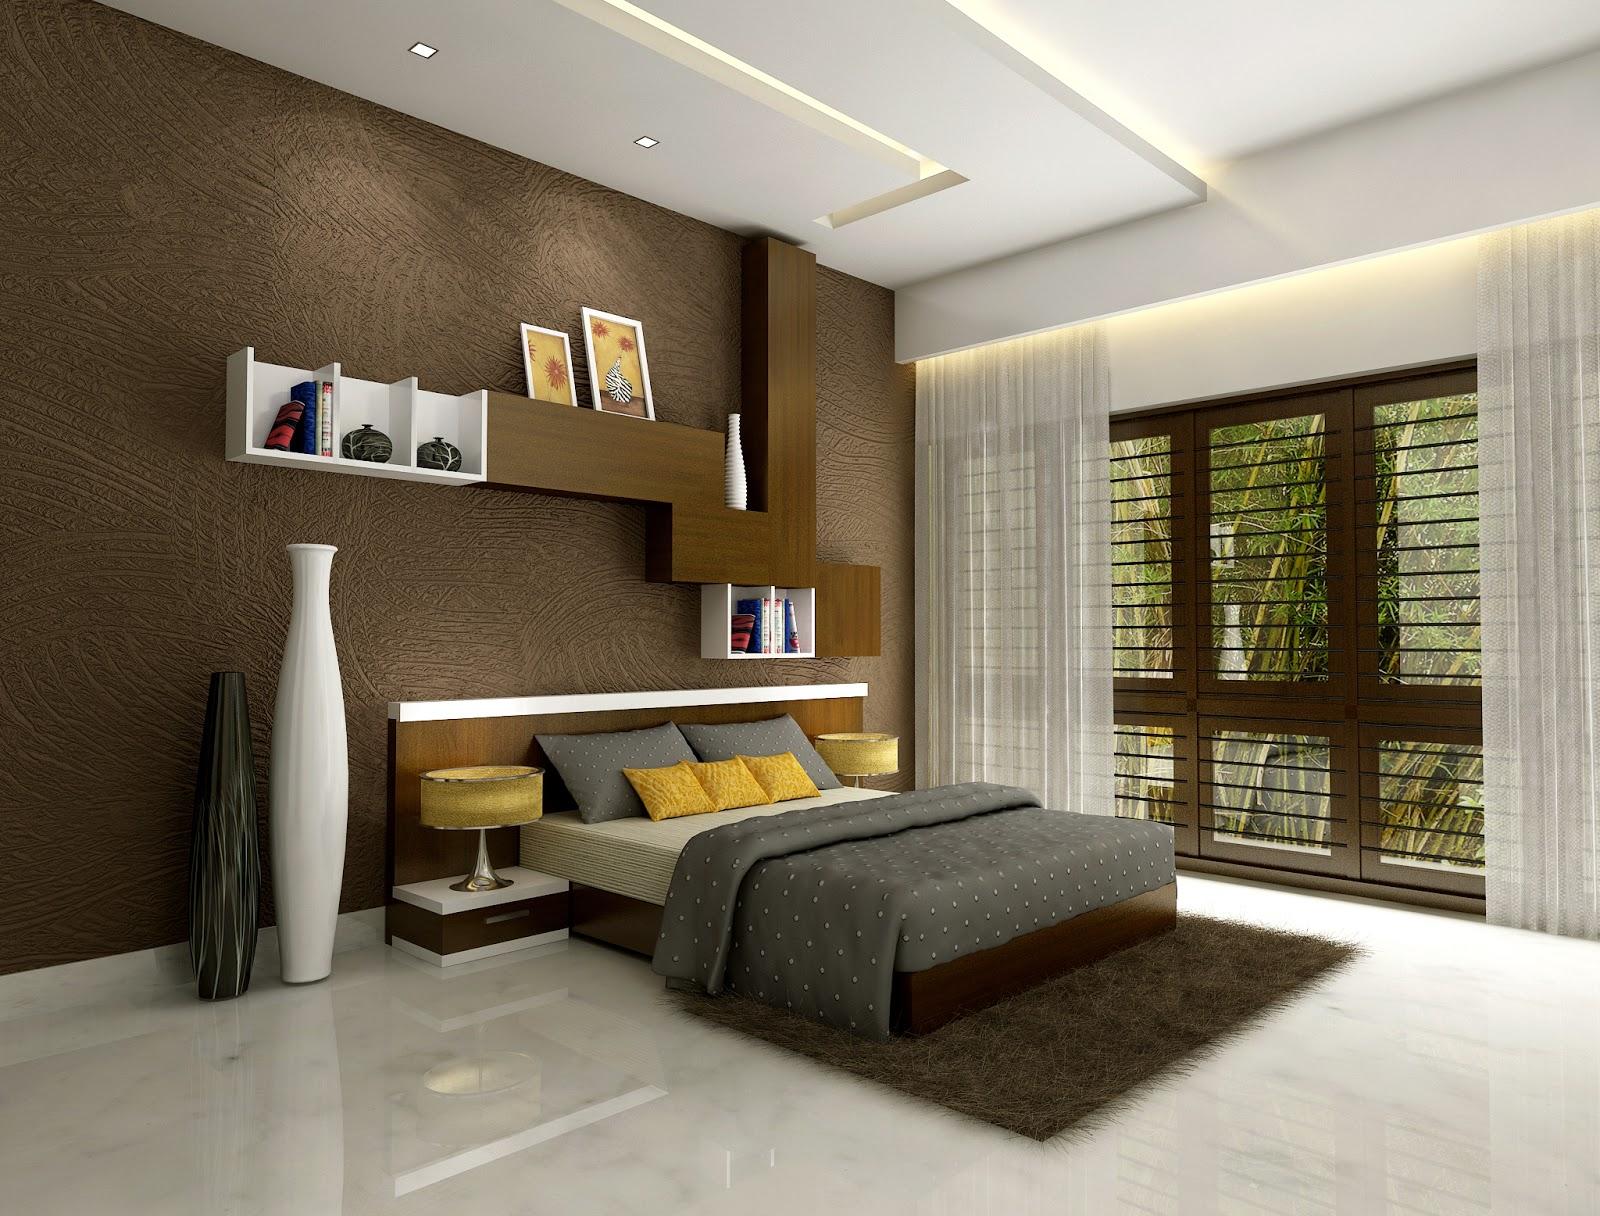 25 Best Modern Bedroom Designs on Room Decore  id=58279